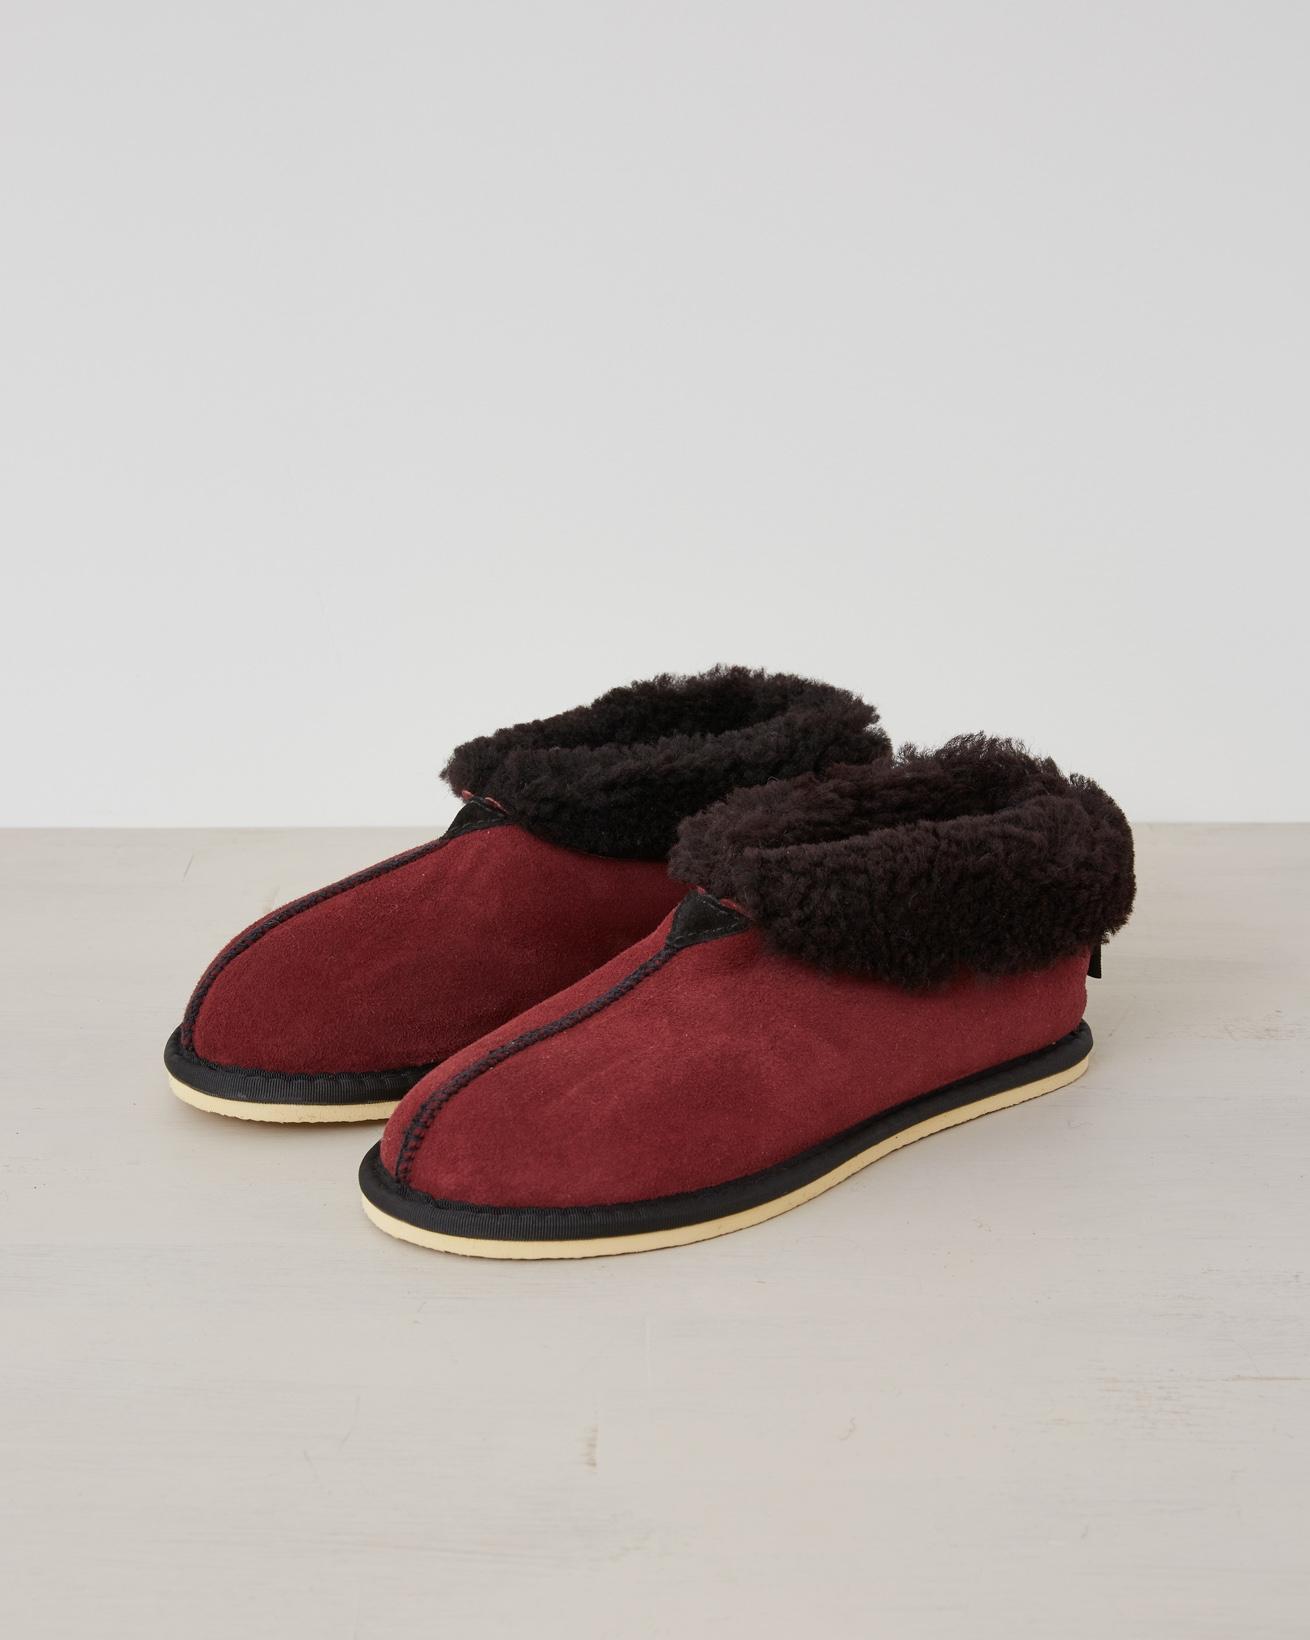 Ladies Sheepskin Bootee Slippers - Claret - Size 5 - 2539